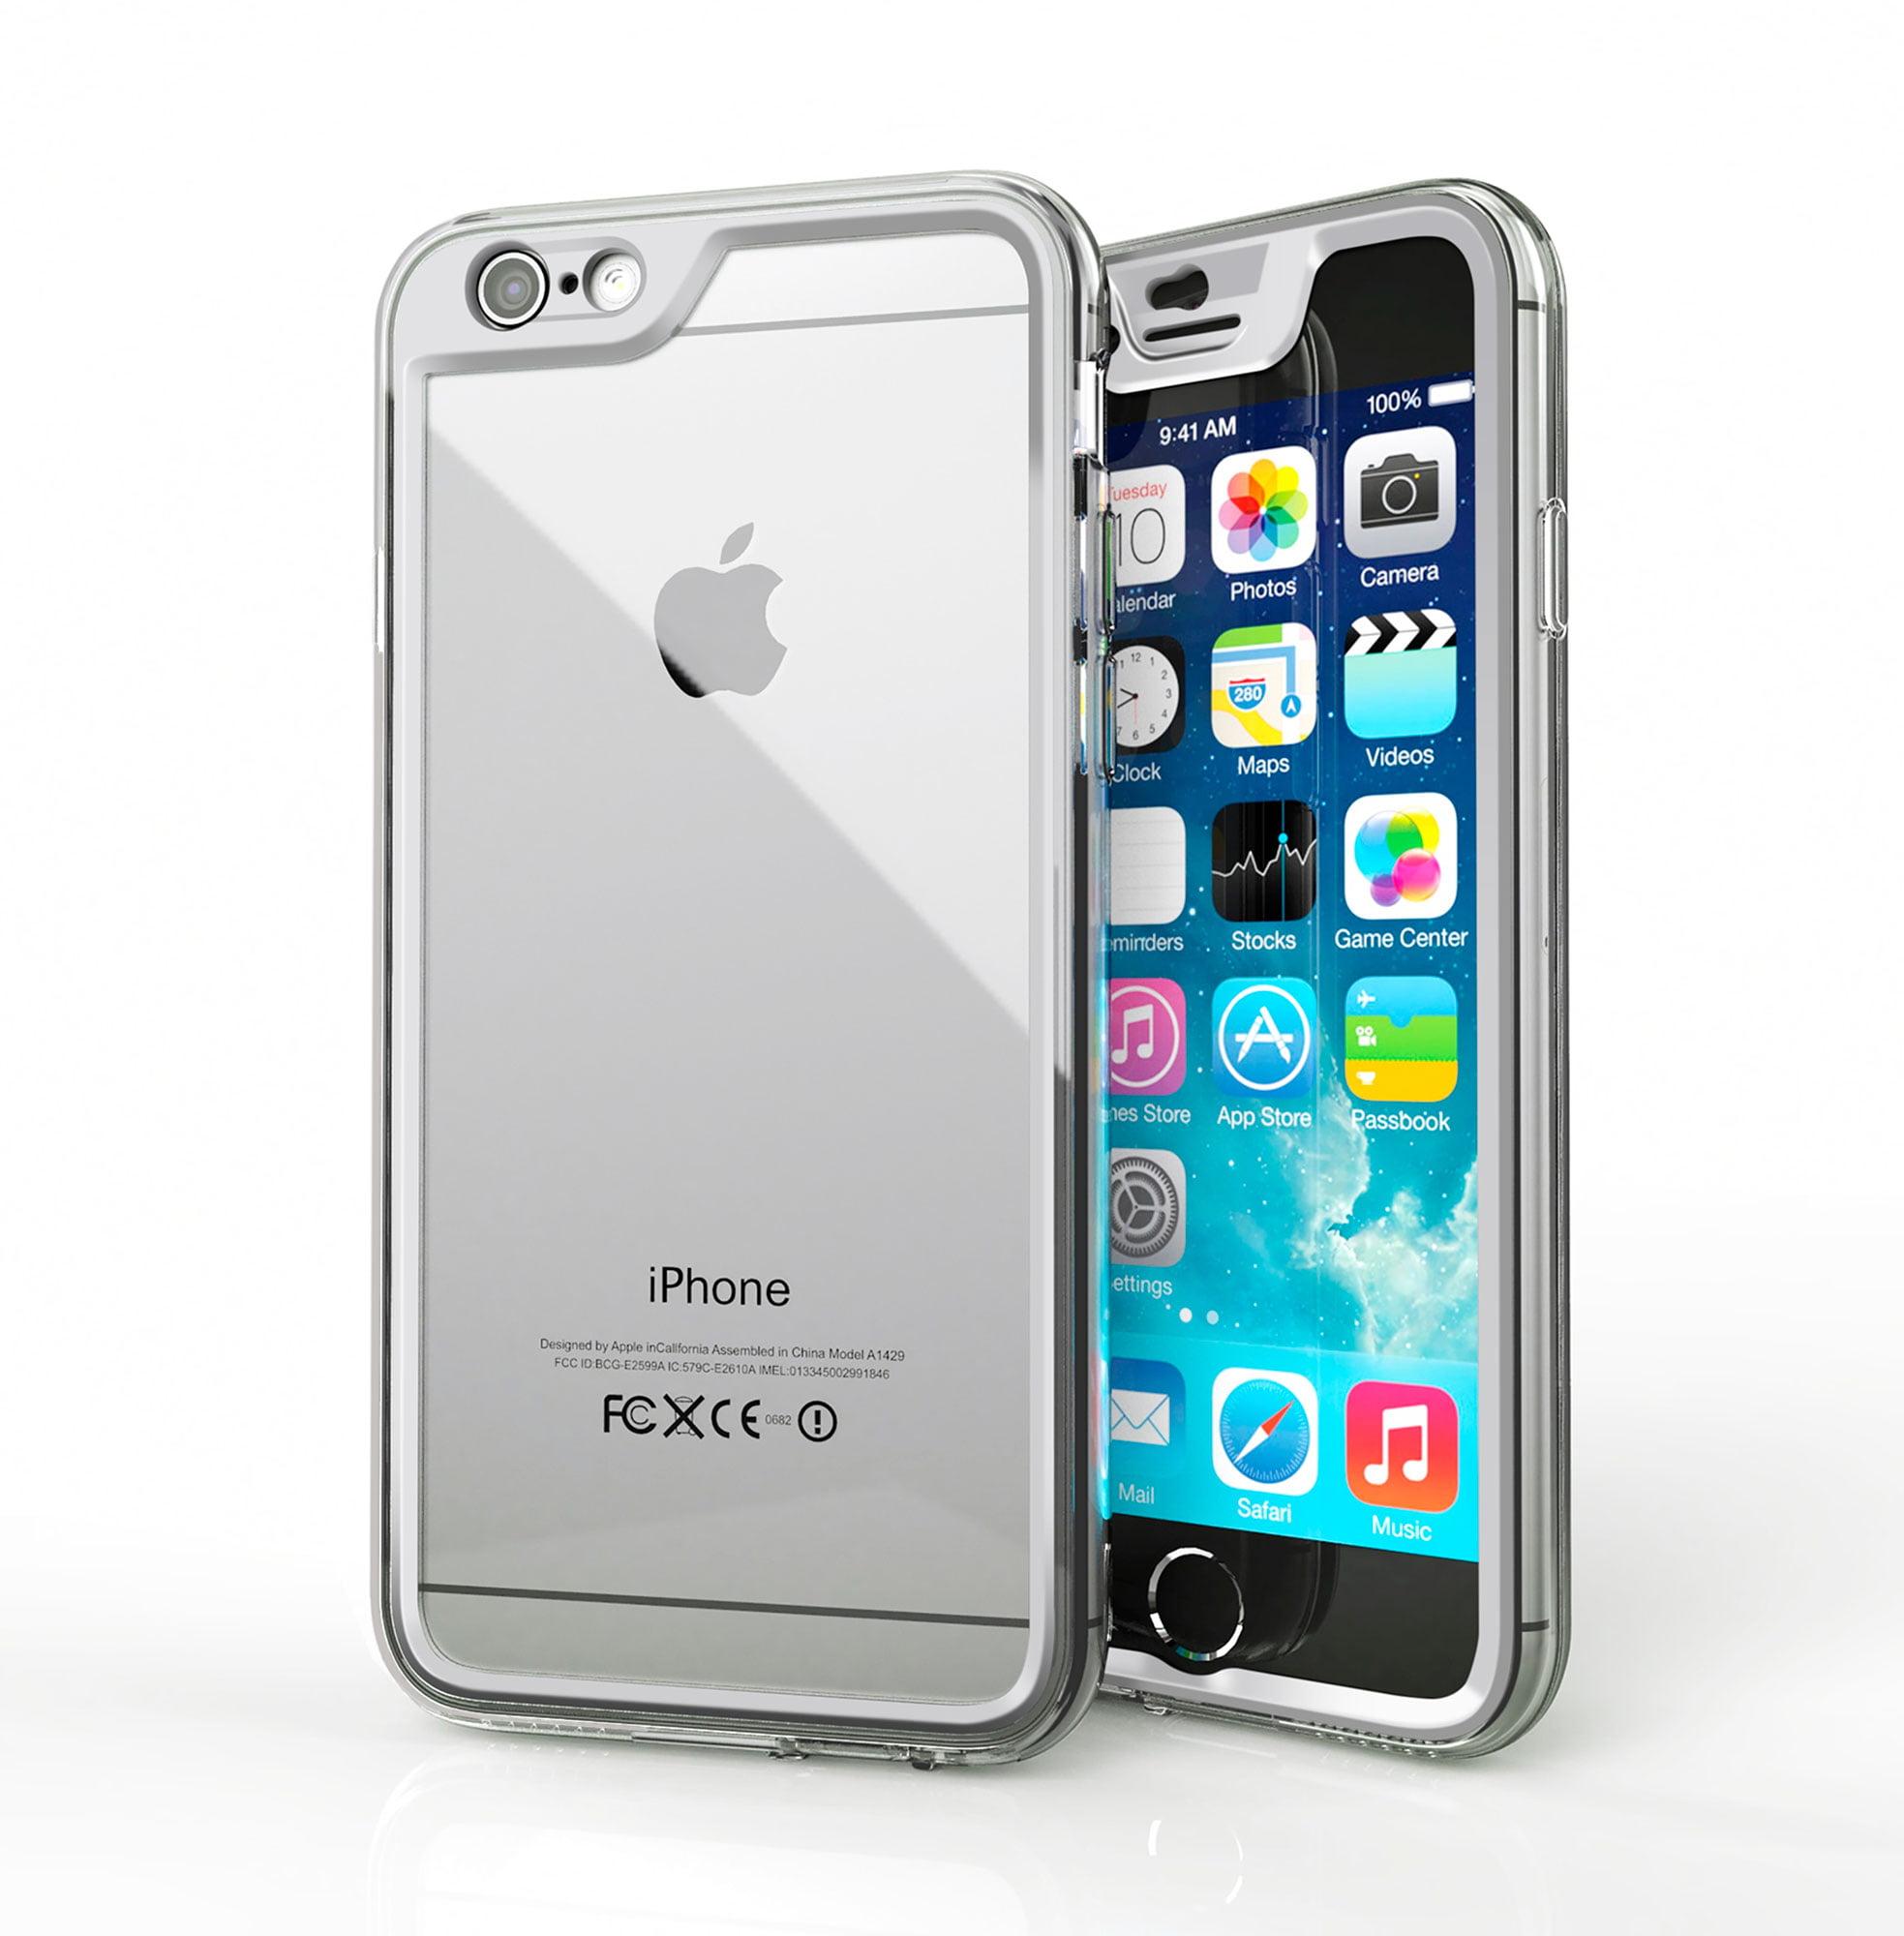 iPhone 6s Case, Gelledge Premium Hybrid PC / TPU Protective Full Body Case Cover (Alpine White) for Apple iPhone 6 / 6s (2015)